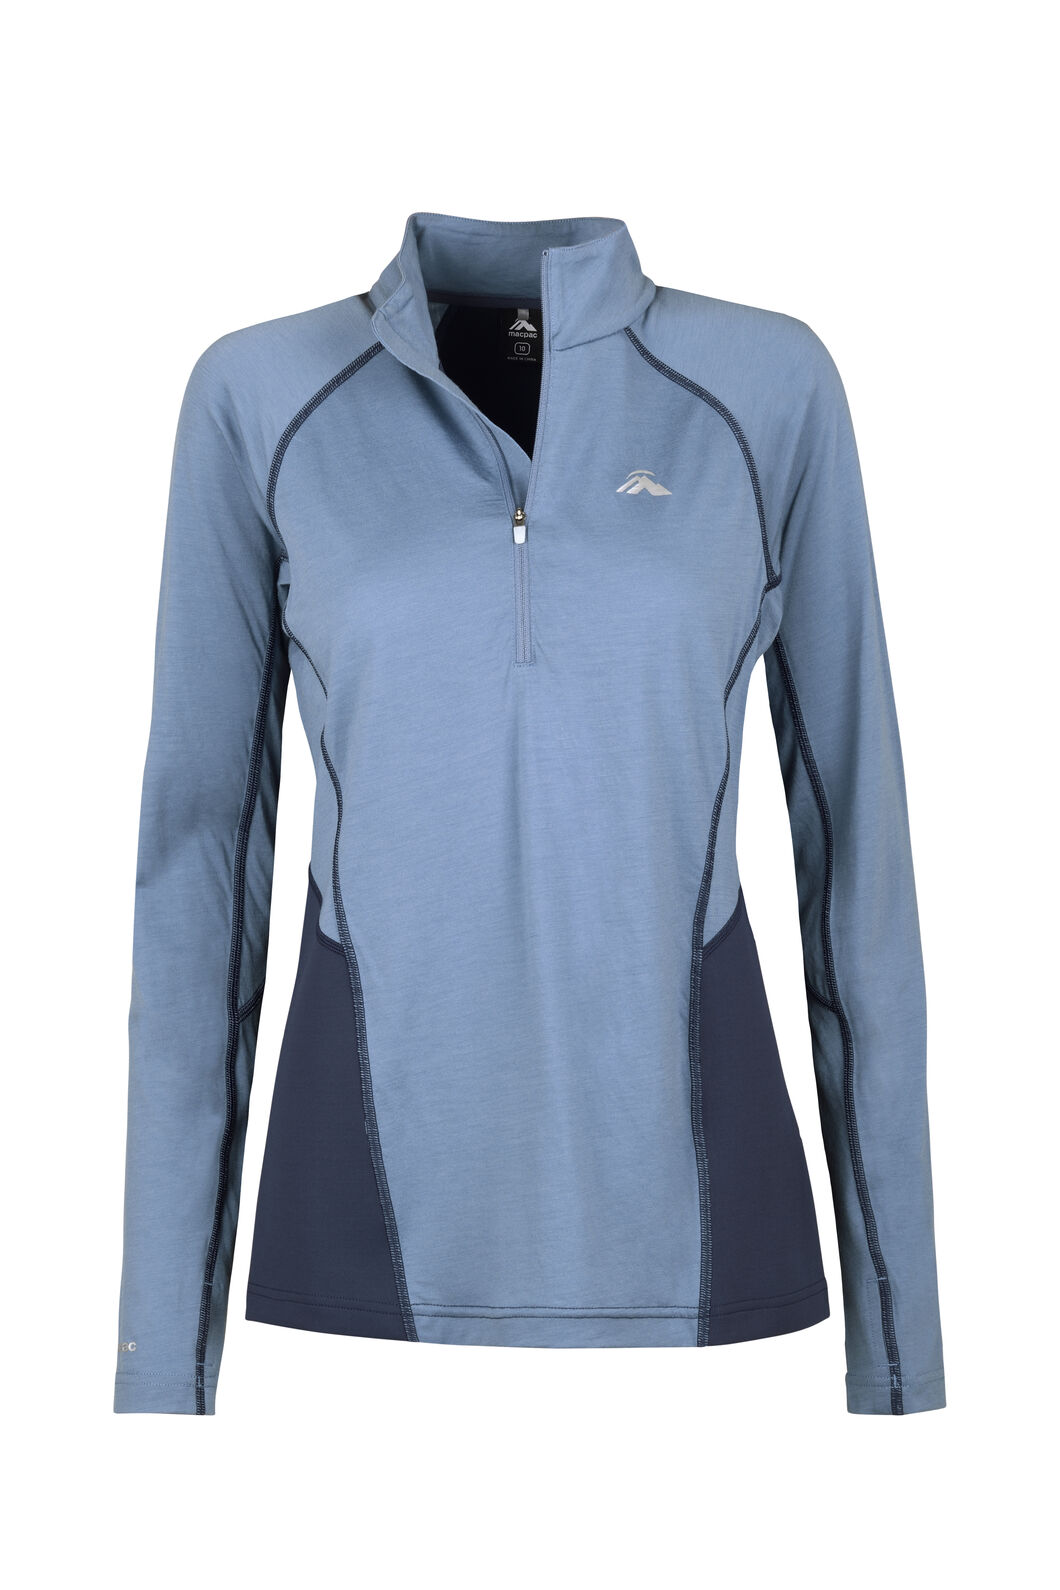 Macpac Casswell Long Sleeve Shirt - Women's, China Blue/Mood Indigo, hi-res